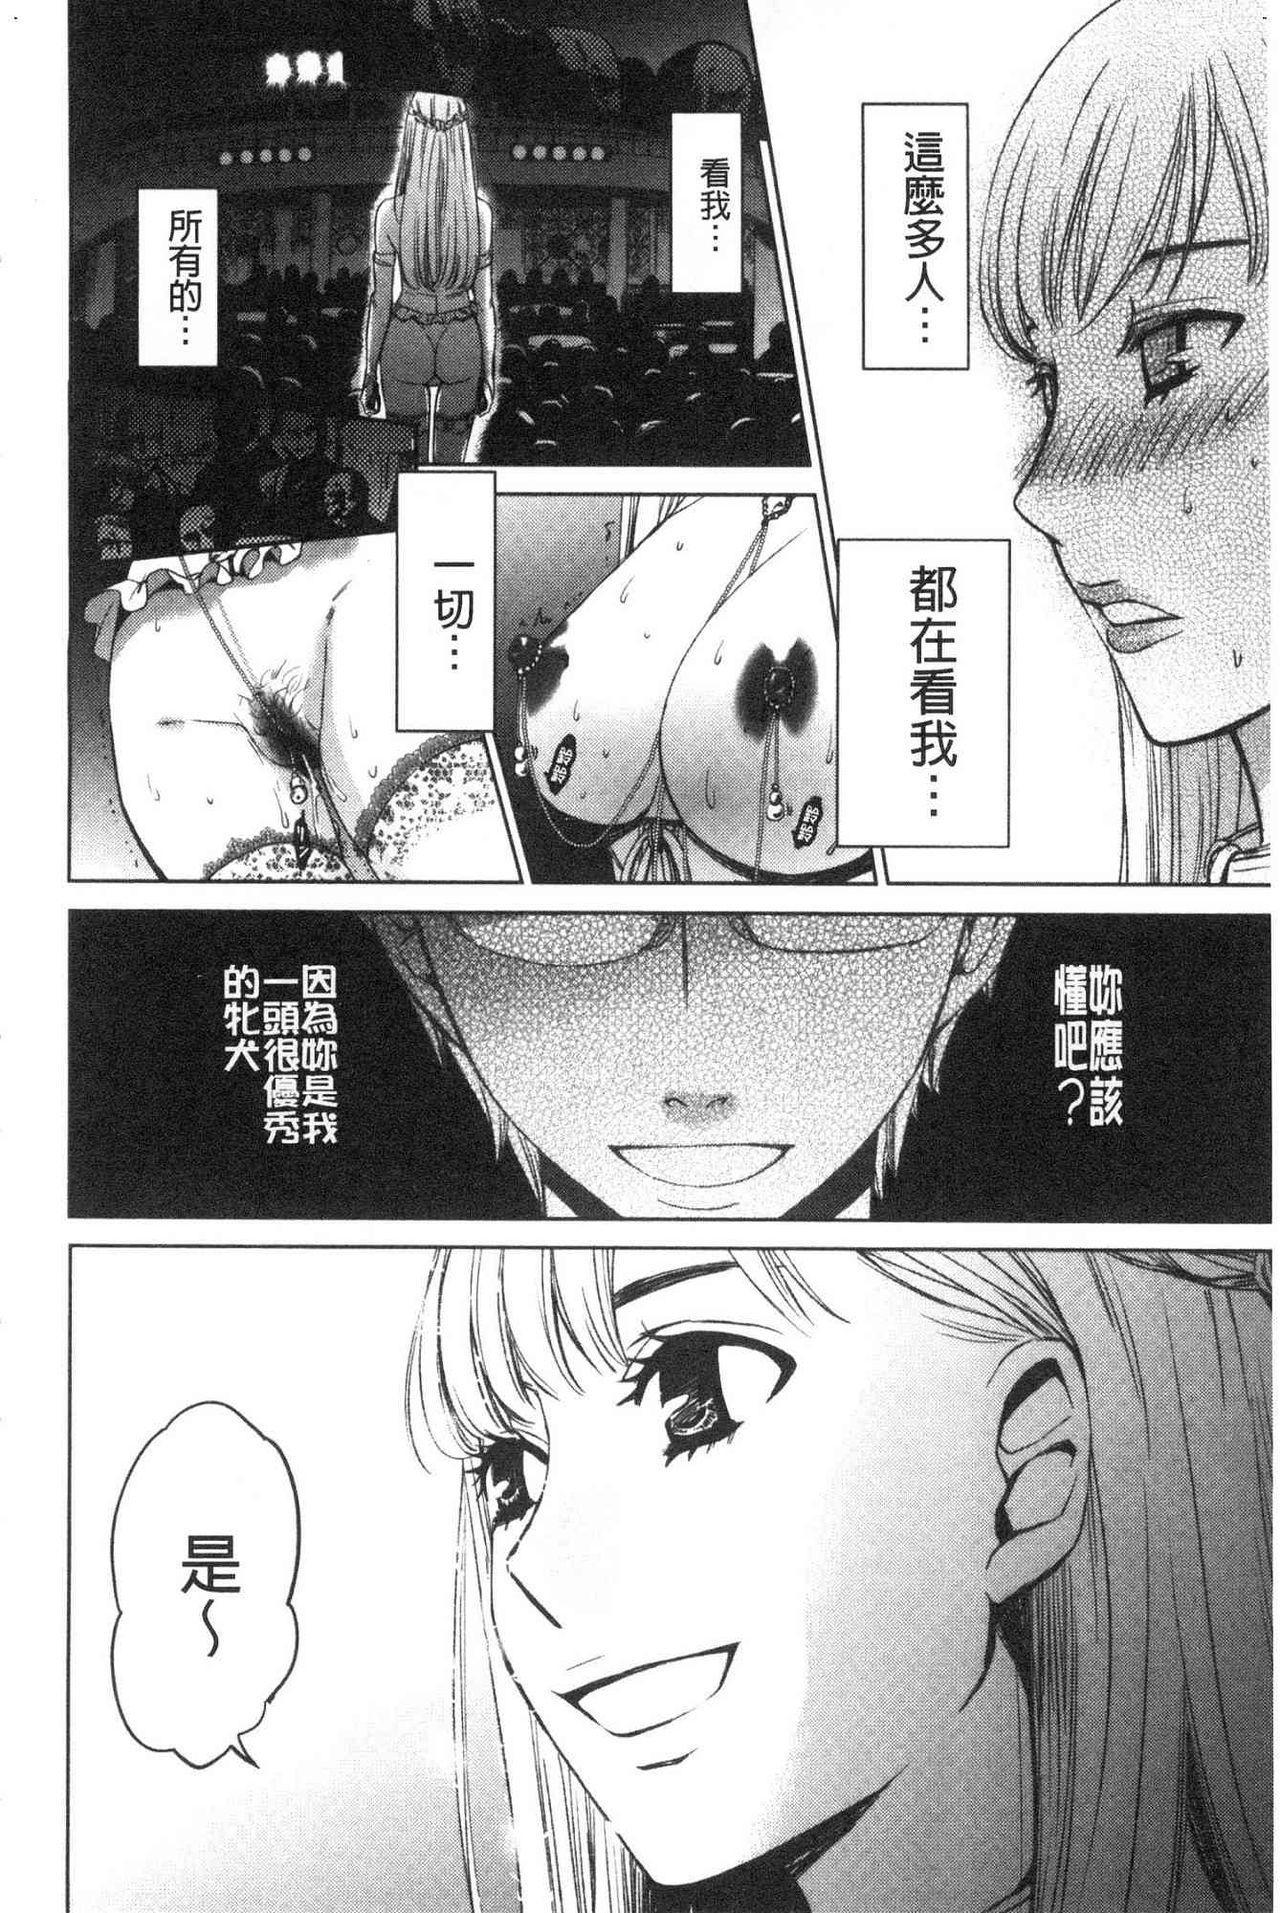 [Gotoh Akira]  21-ji no Onna ~Camera no Mae no Mesuinu~ 2 | 21時之女 ~鏡頭前的牝犬~ 2 [Chinese] 169